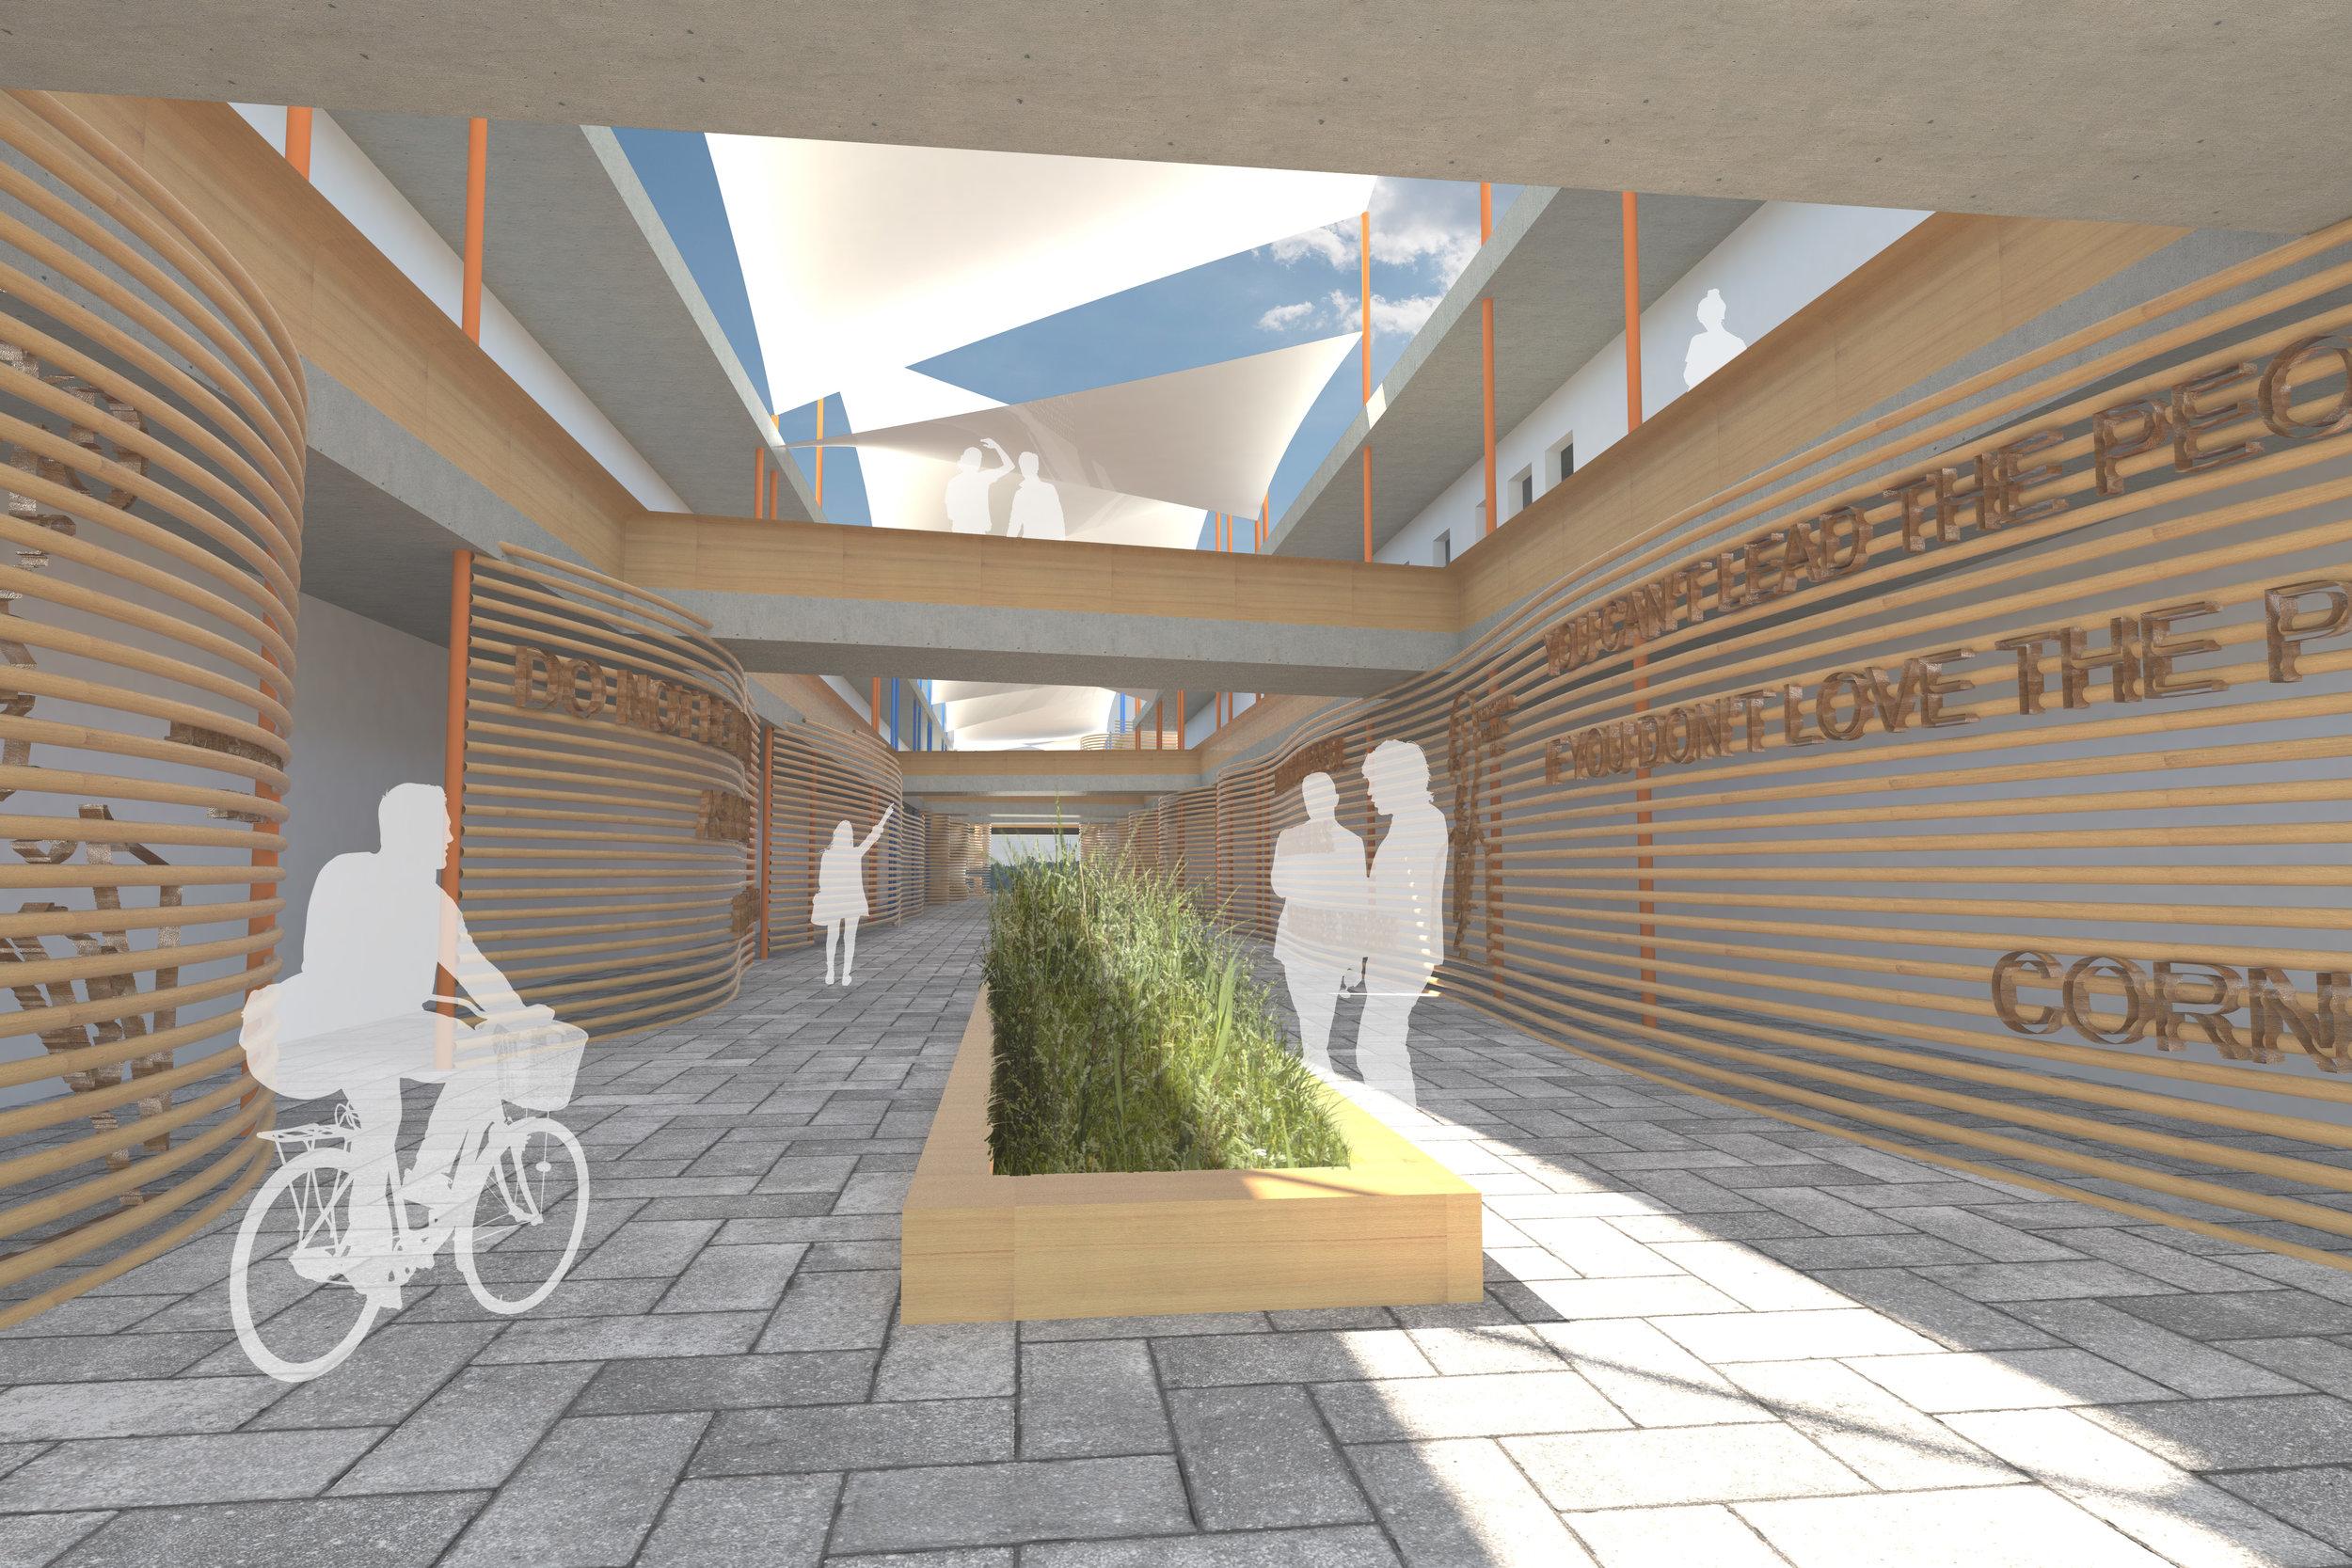 Courtyard final render.jpg